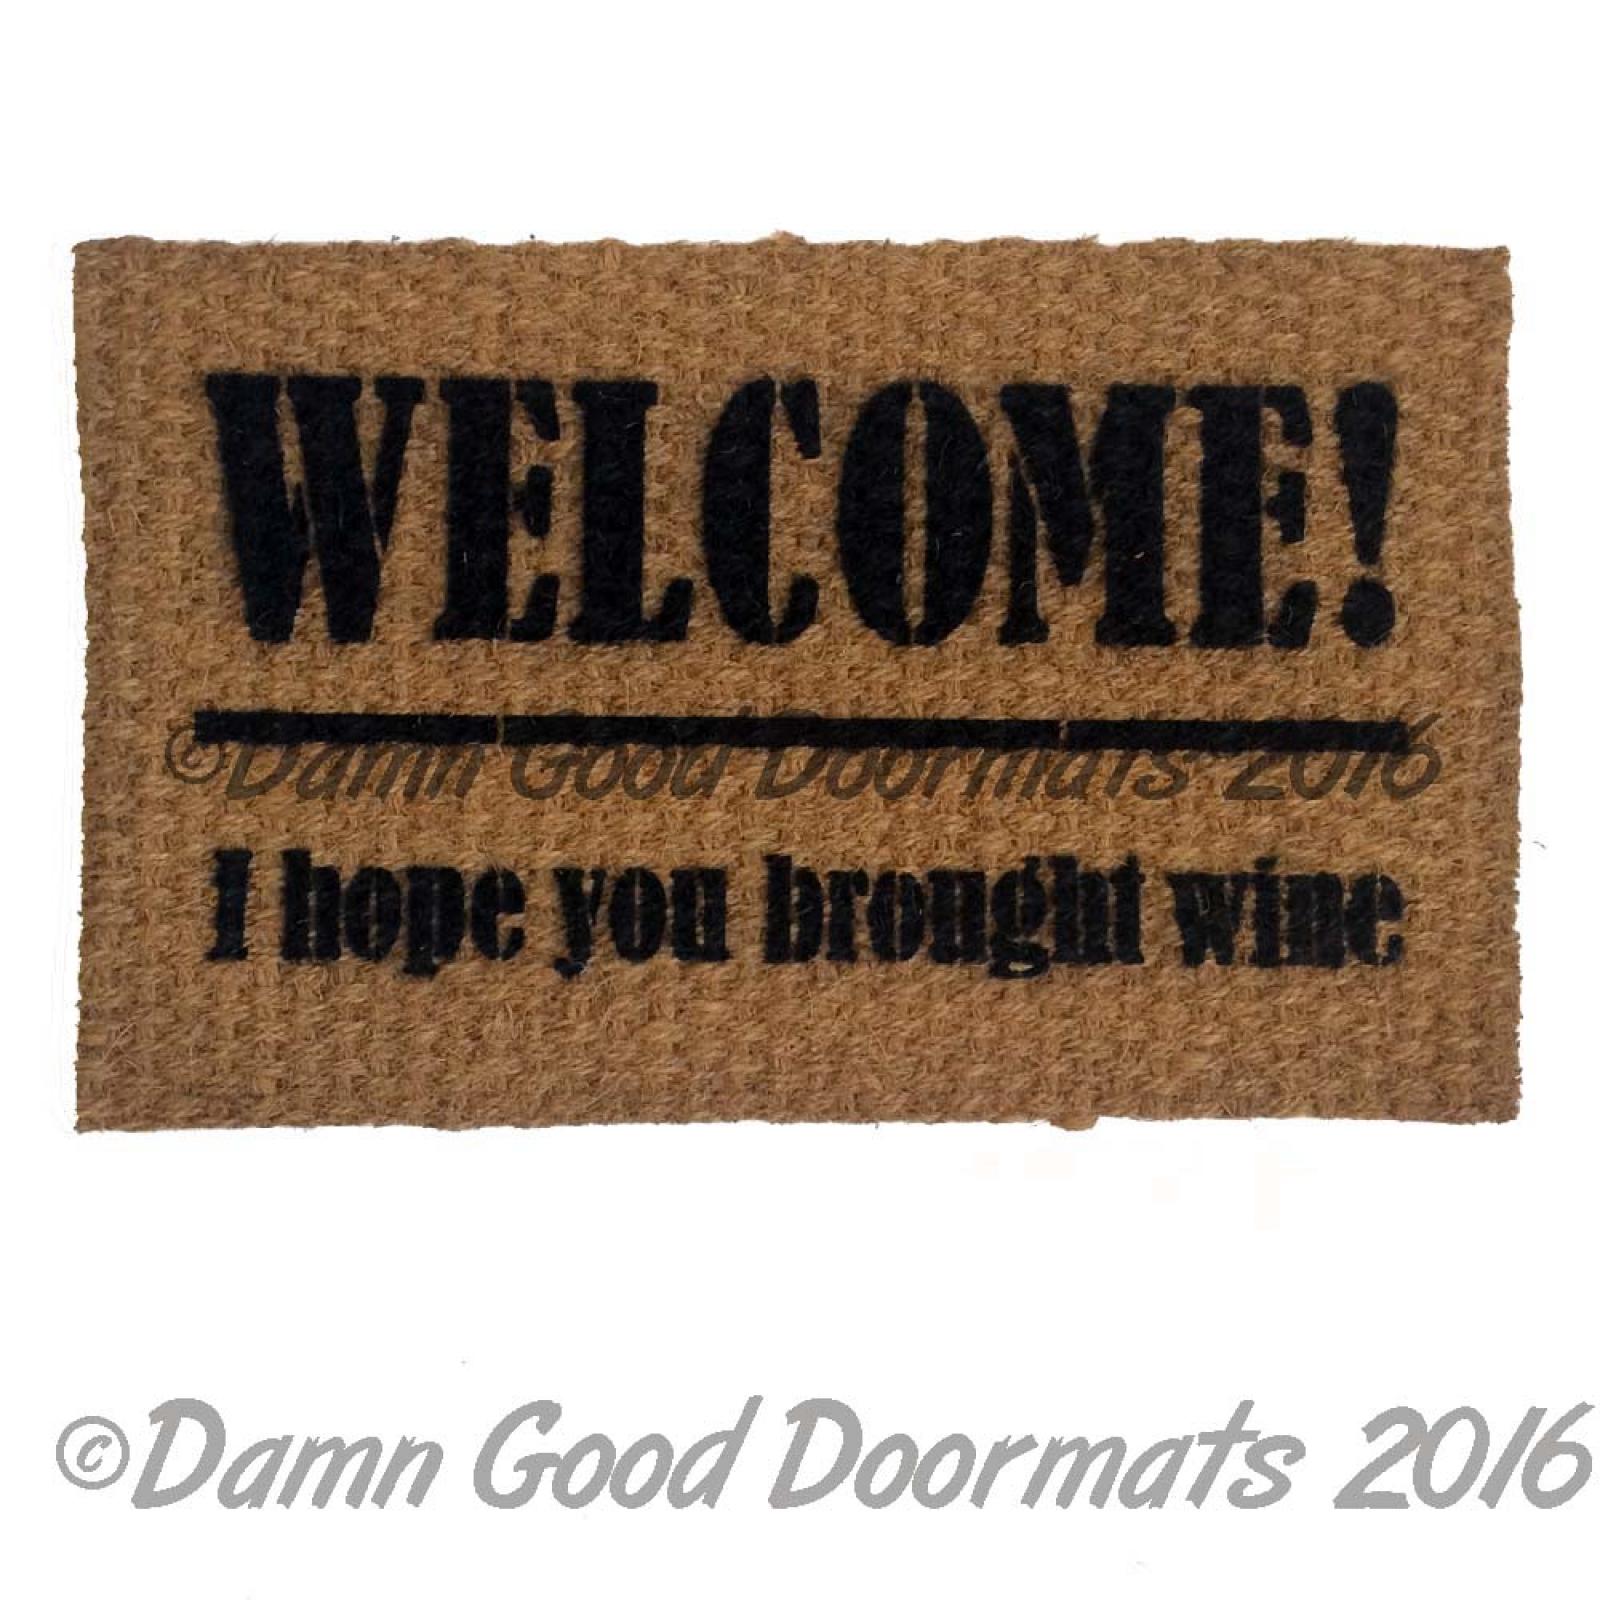 Two Buck Chuck Wine Welcome Here Cheap Wine Doormat